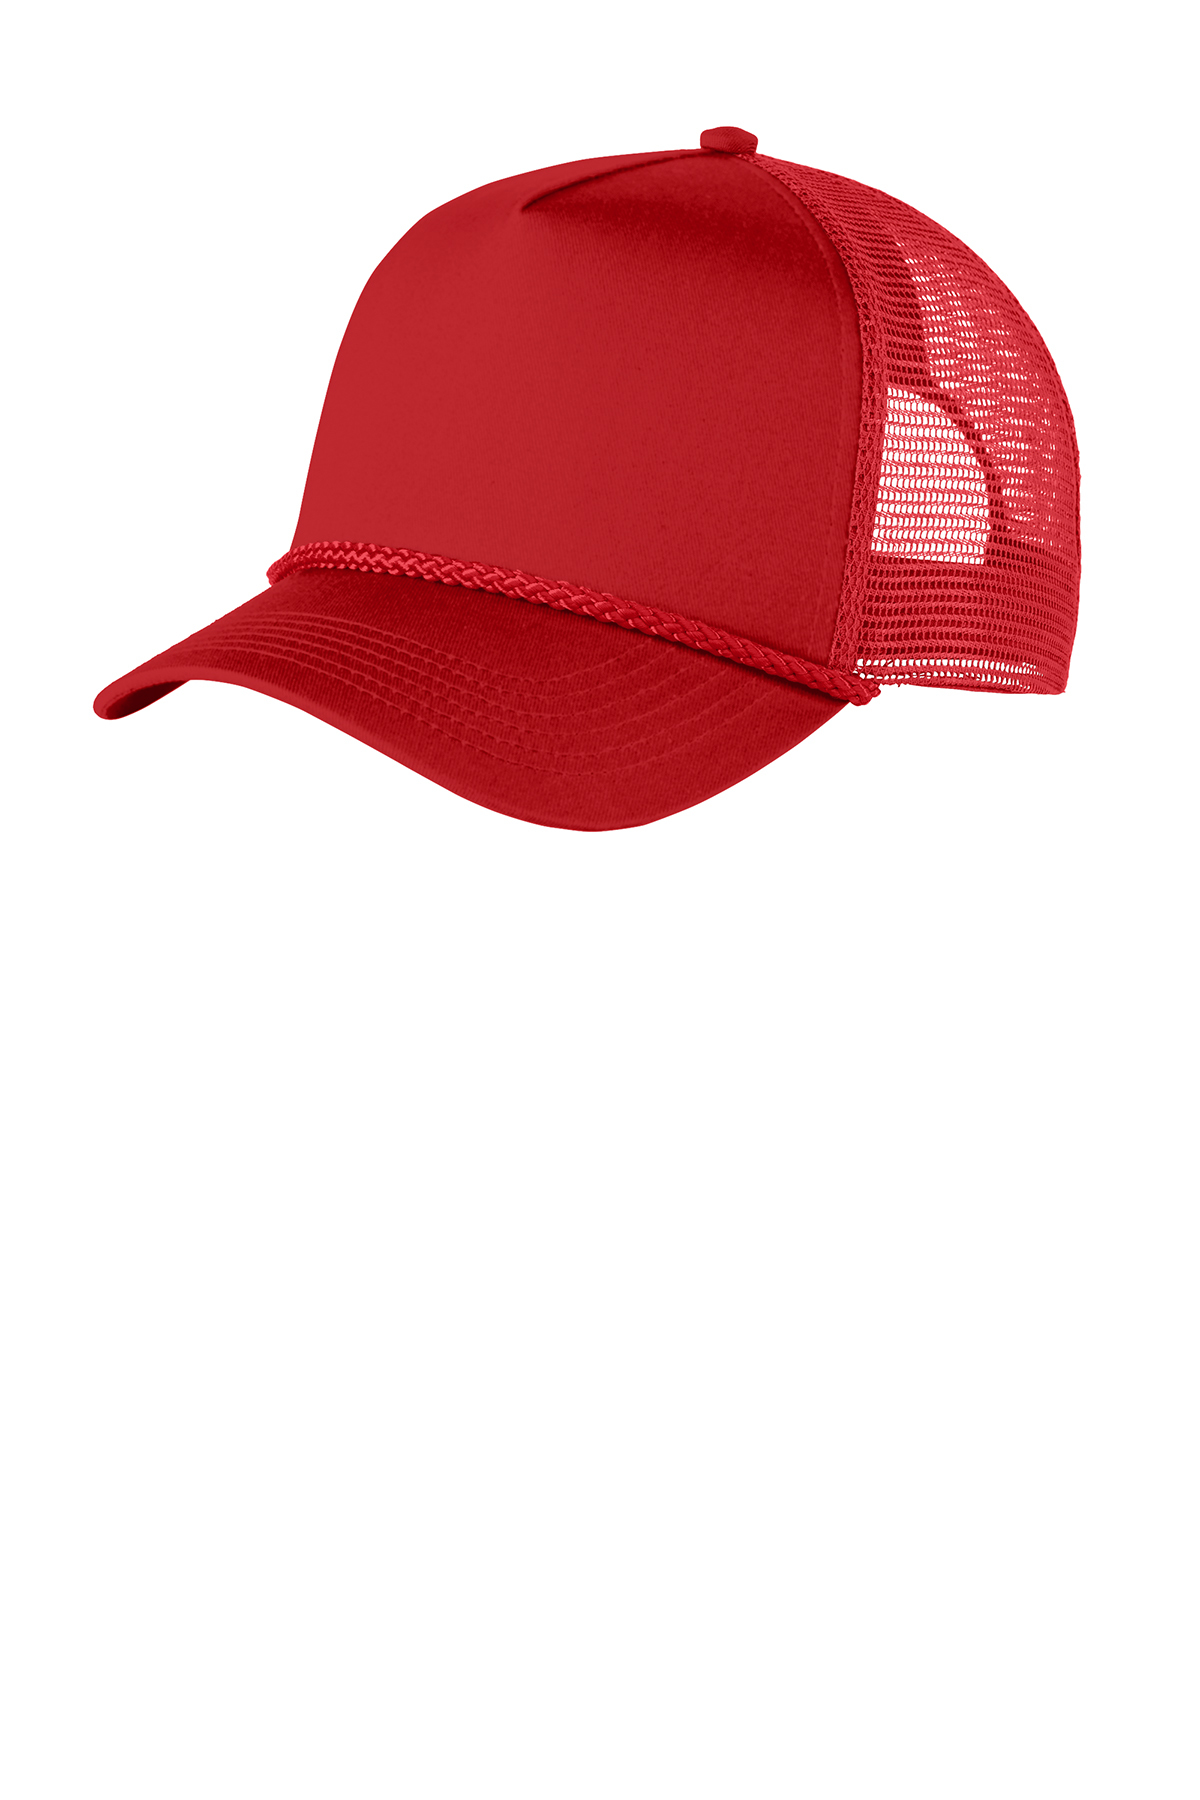 Custom Text on Front C932 Baseball Style   5-Panel Snapback Cap